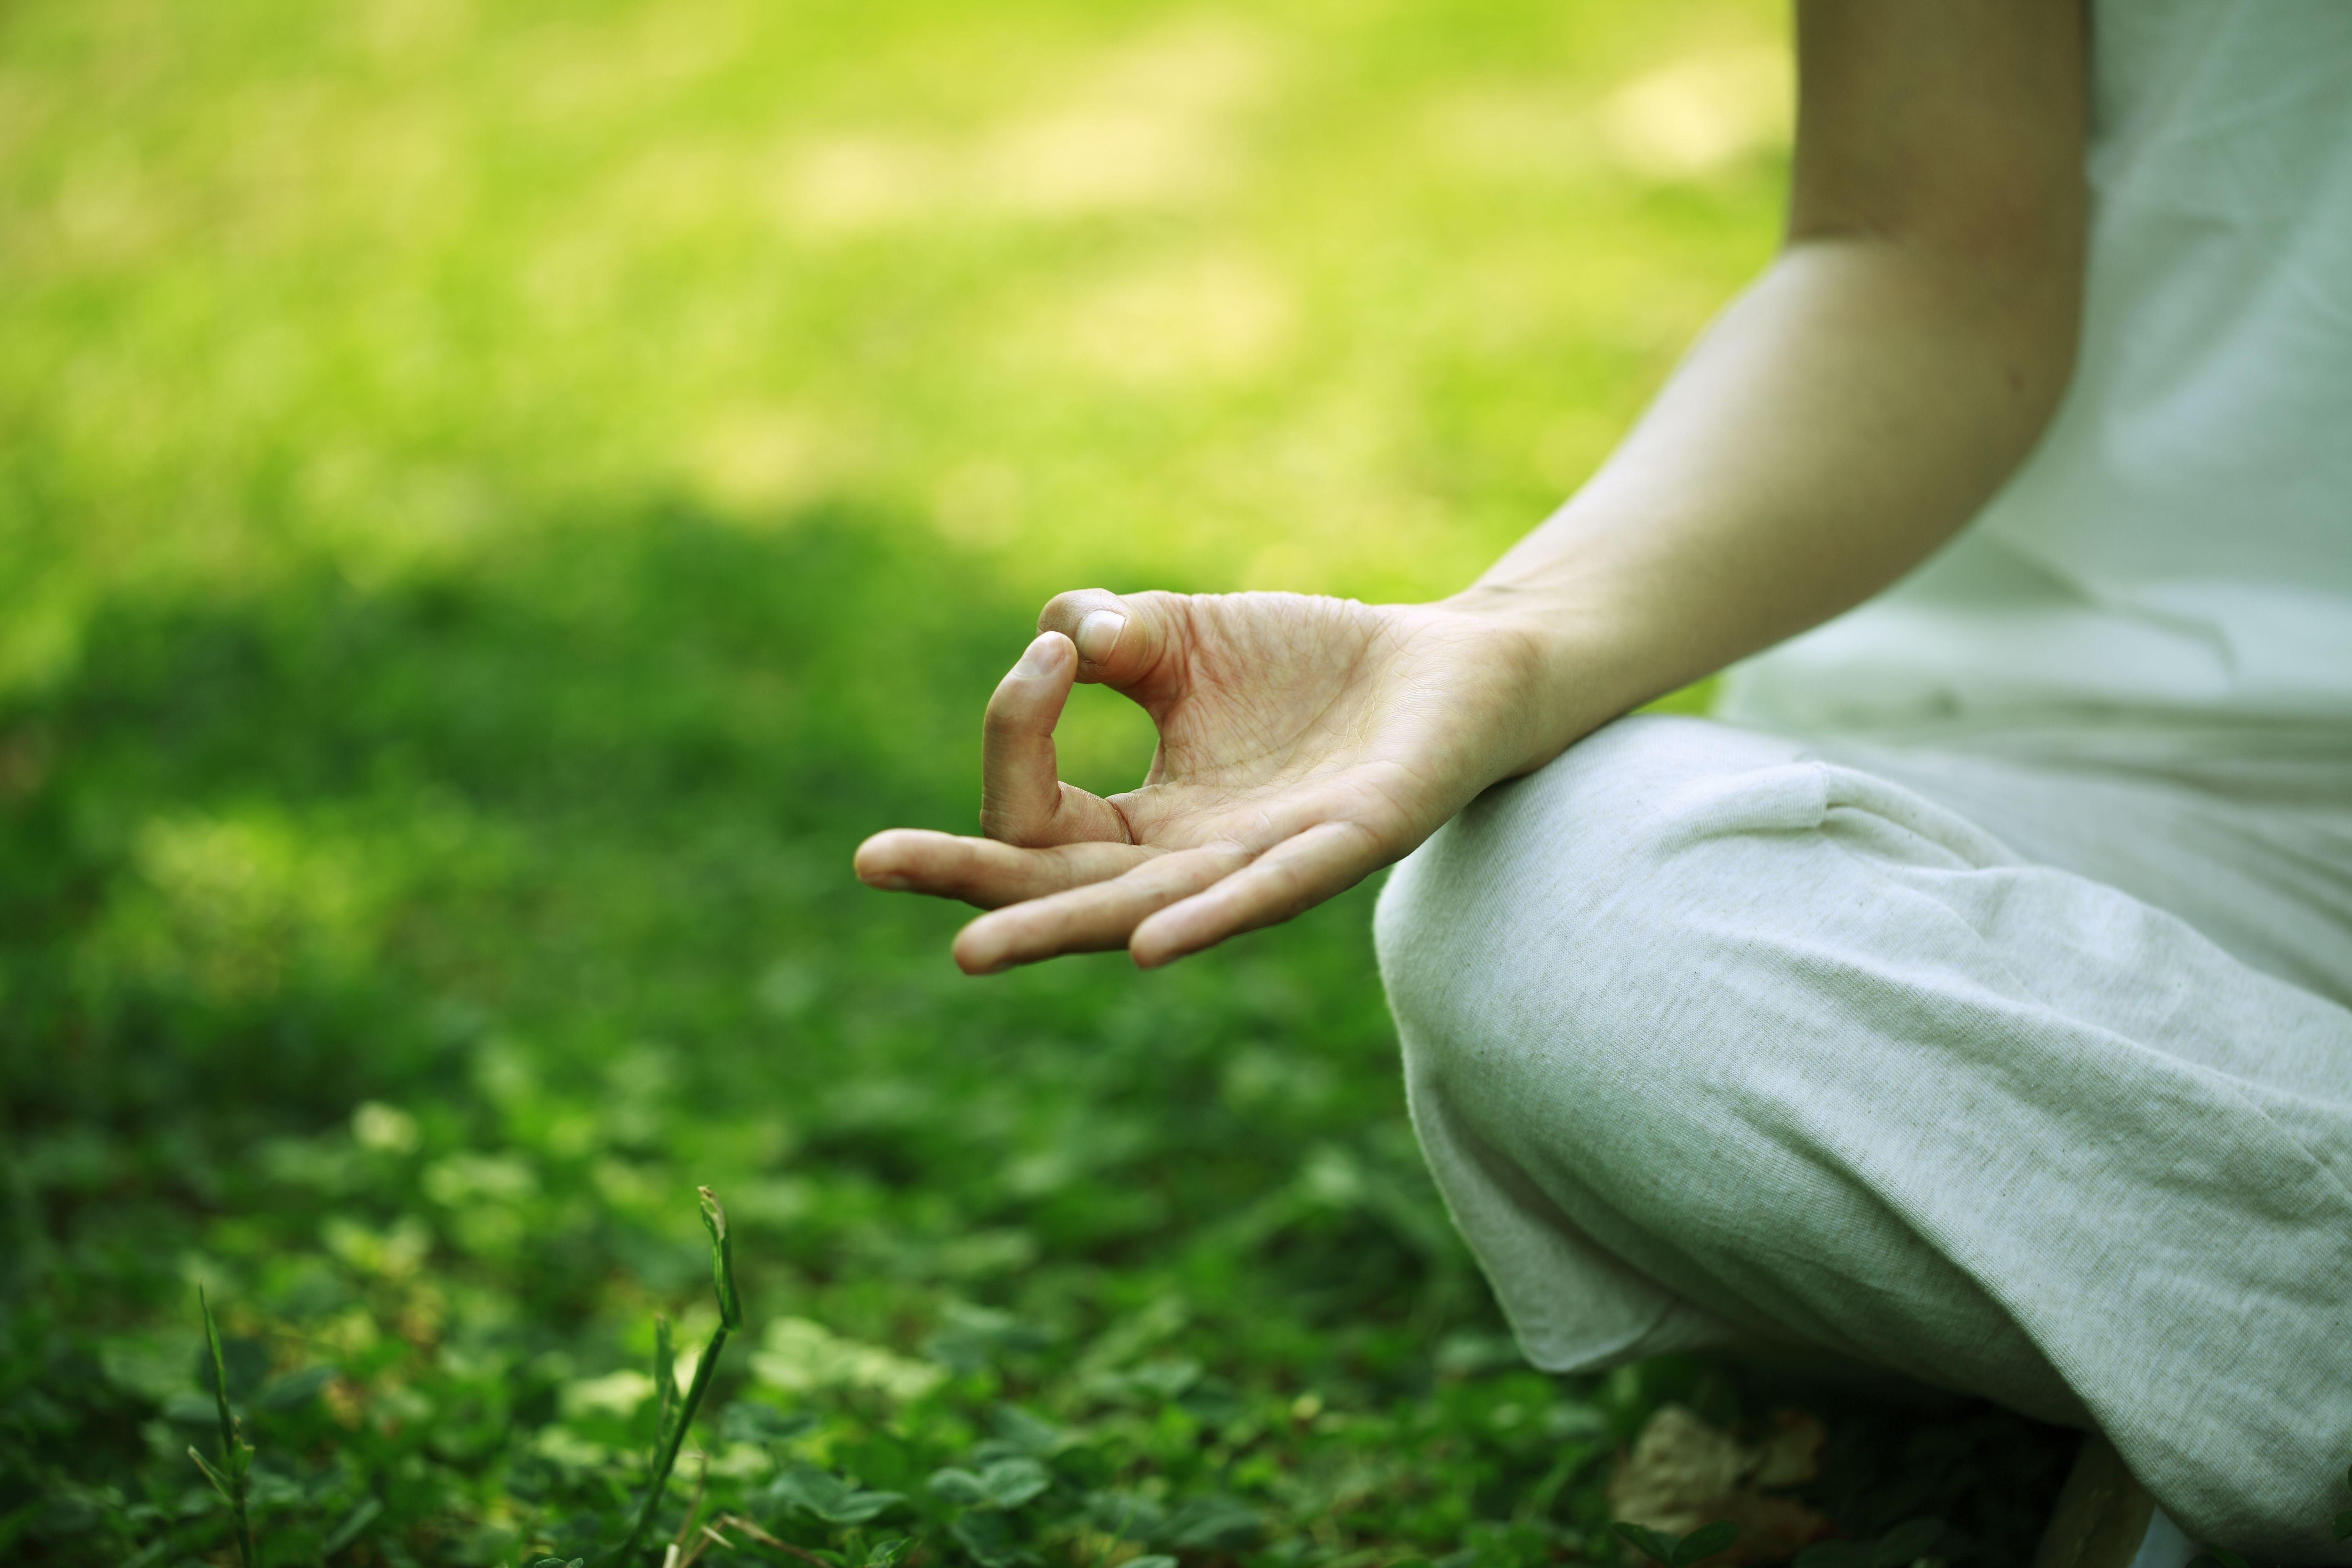 Meditating outside